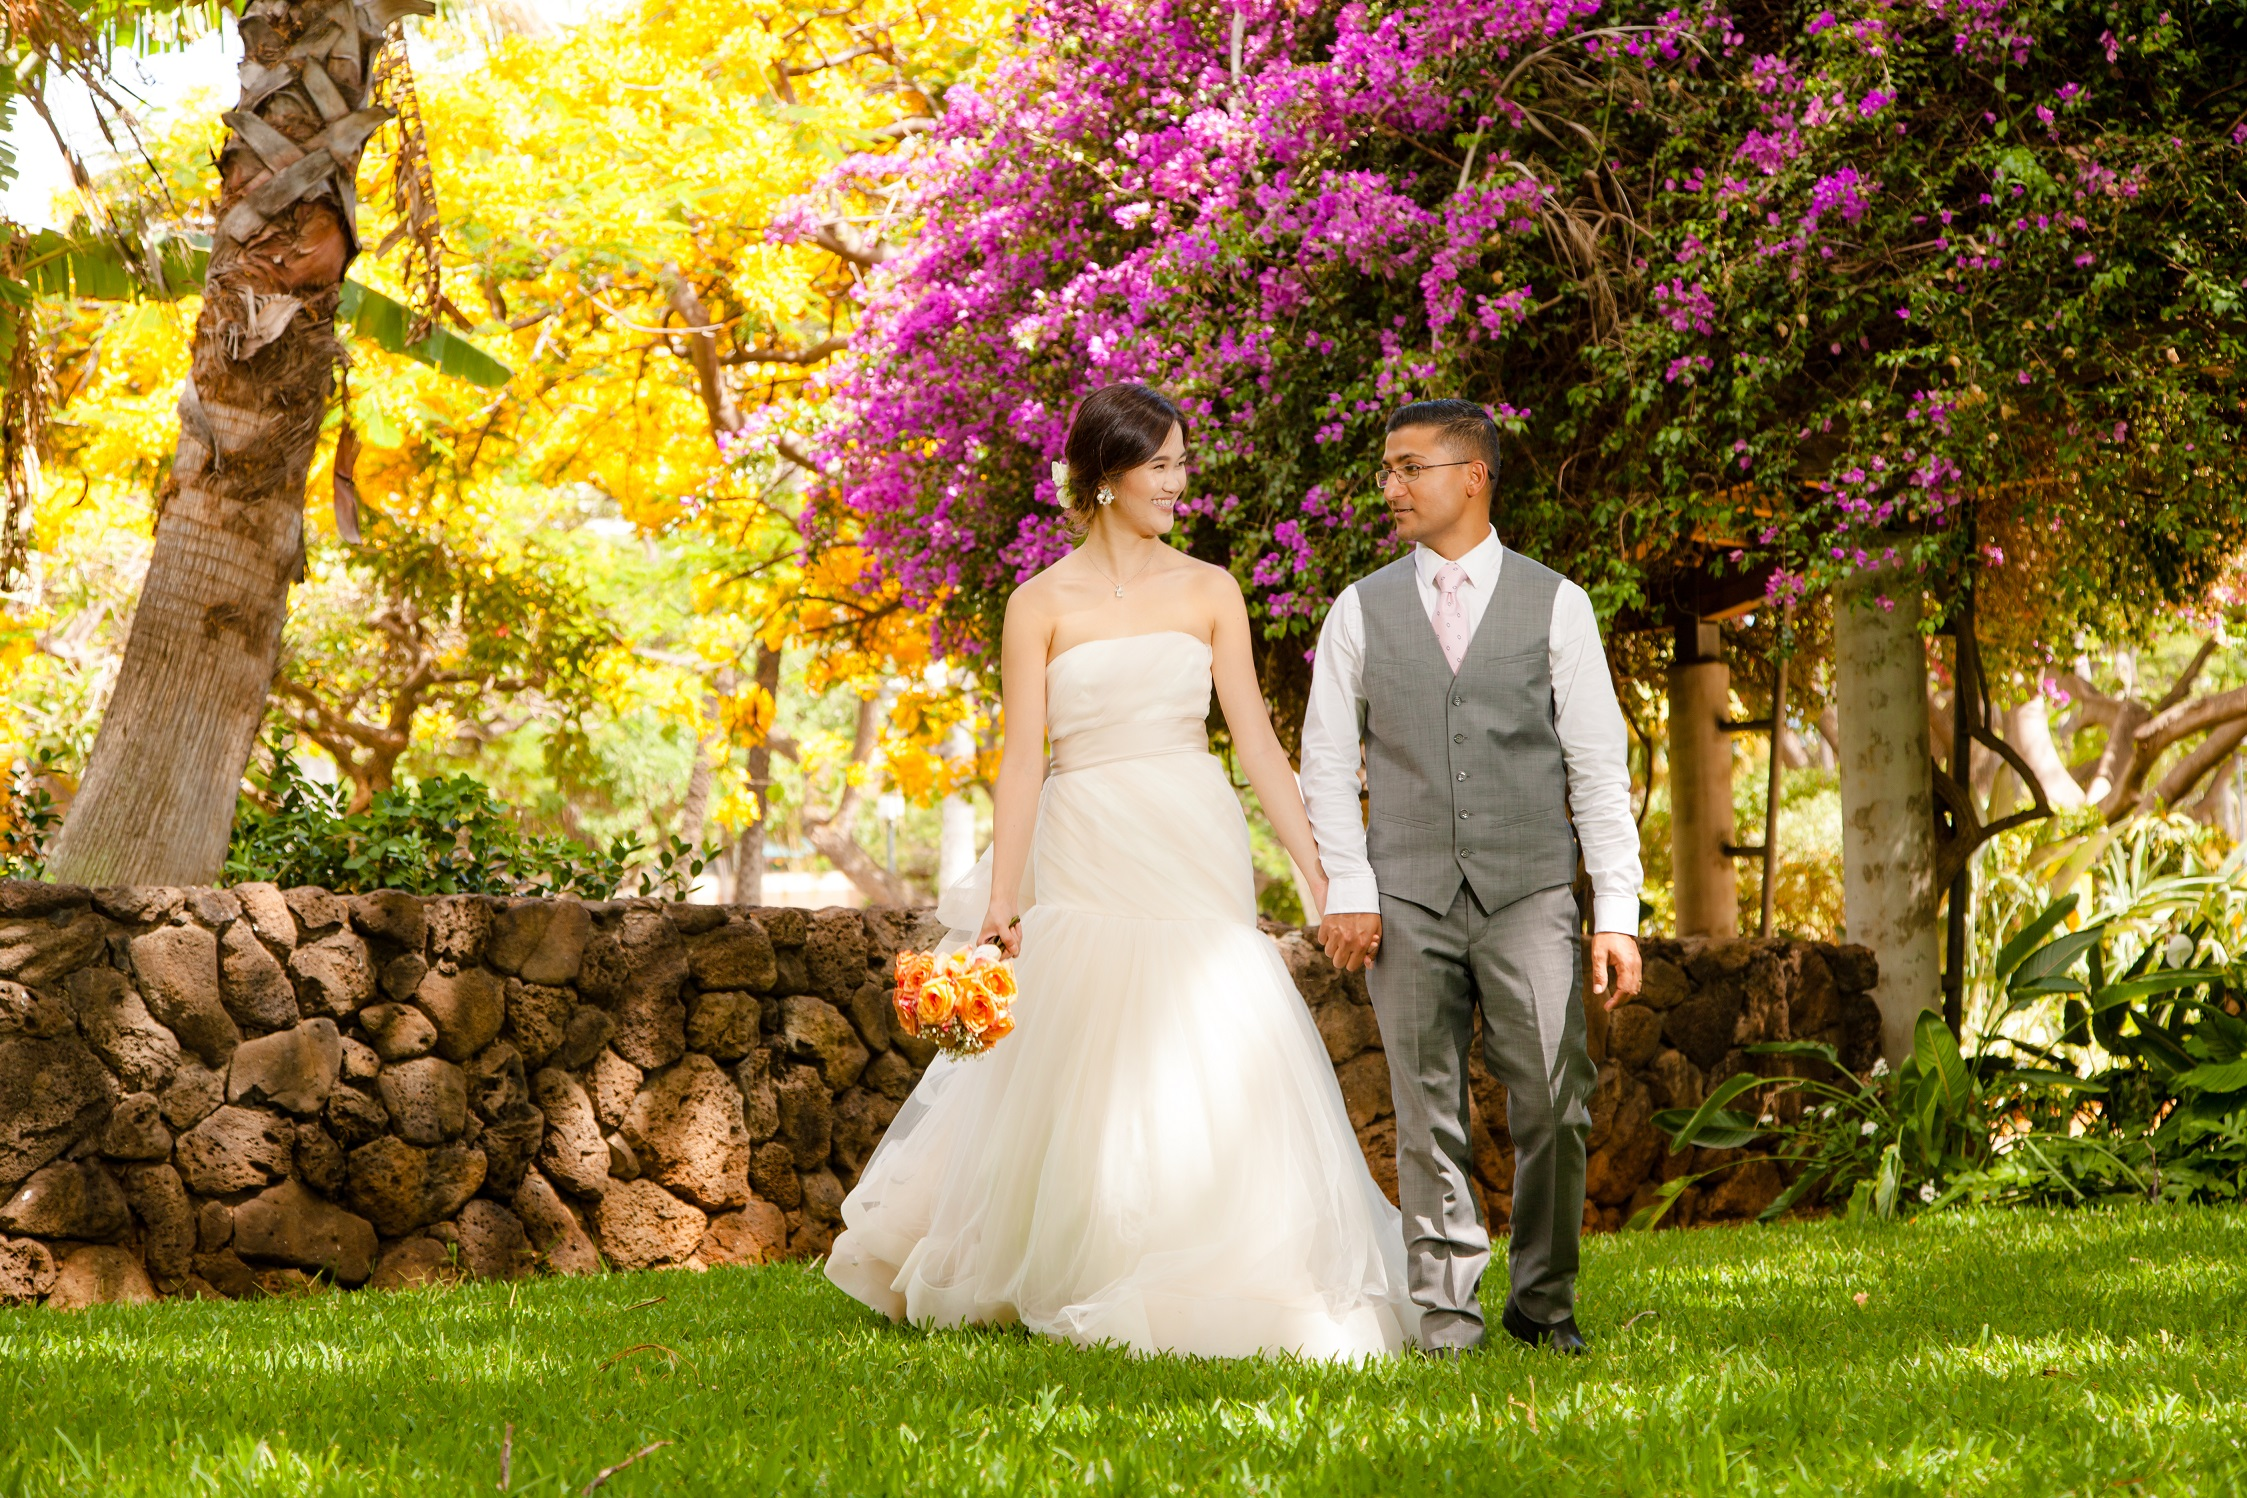 Hale Koa oahu destination wedding photographer